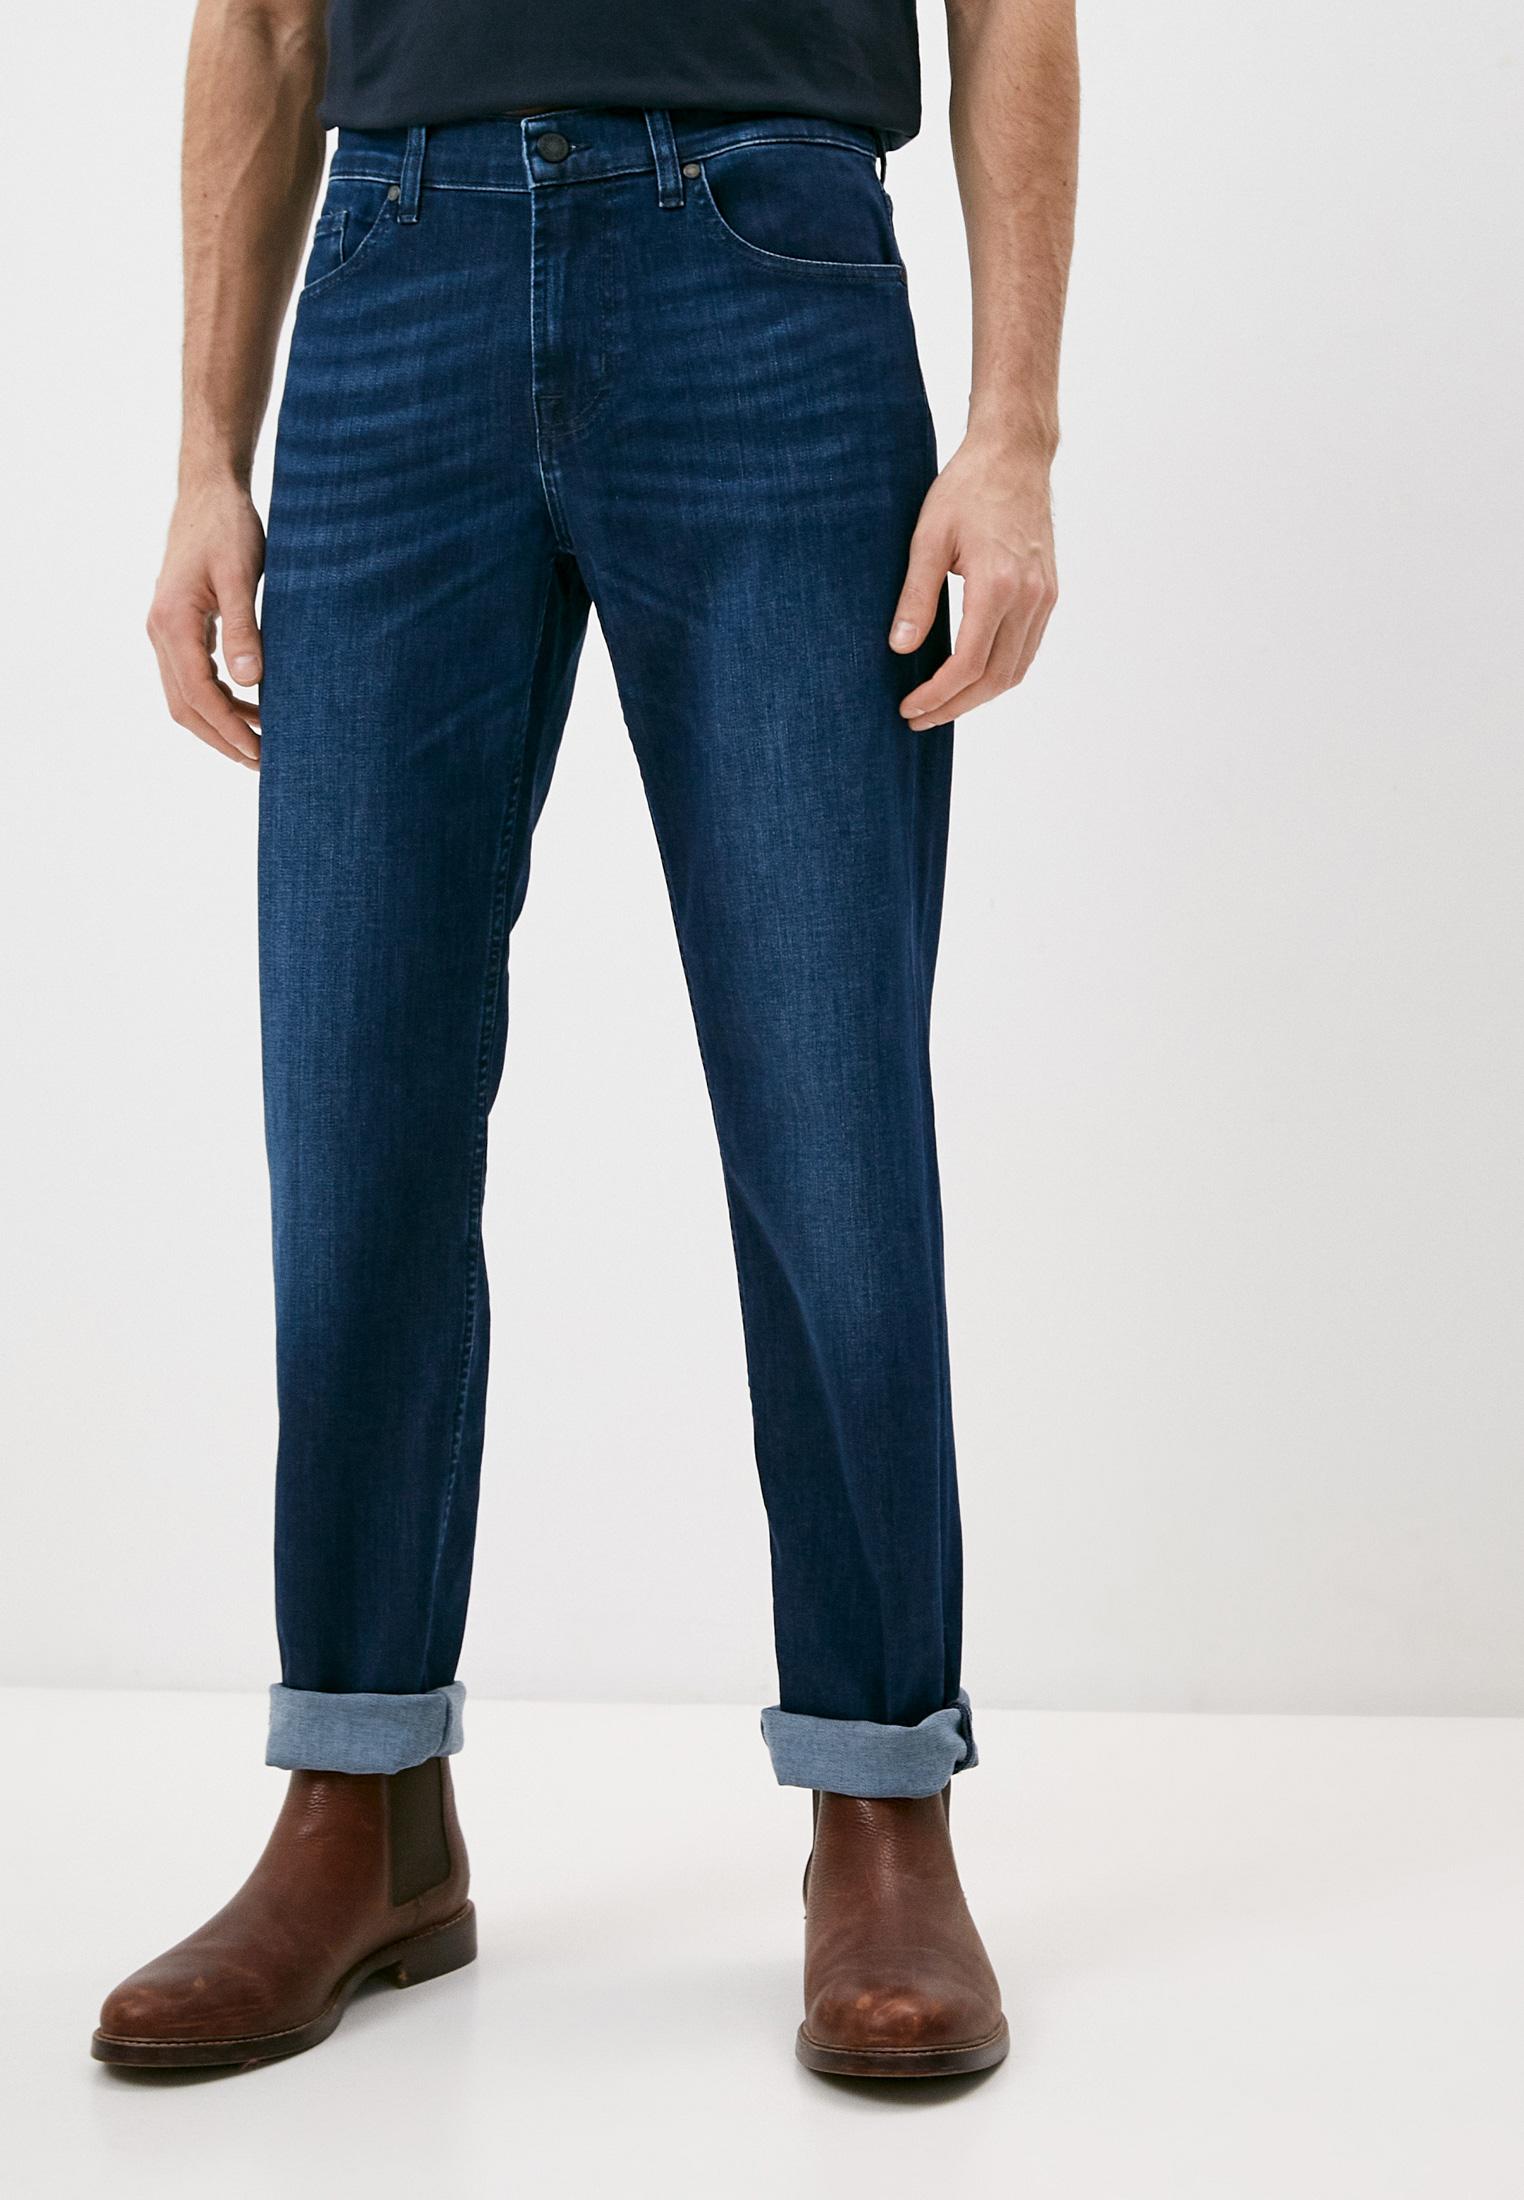 Мужские прямые джинсы 7 For All Mankind (7 Фо Олл Мэнкайнд) Джинсы 7 For All Mankind